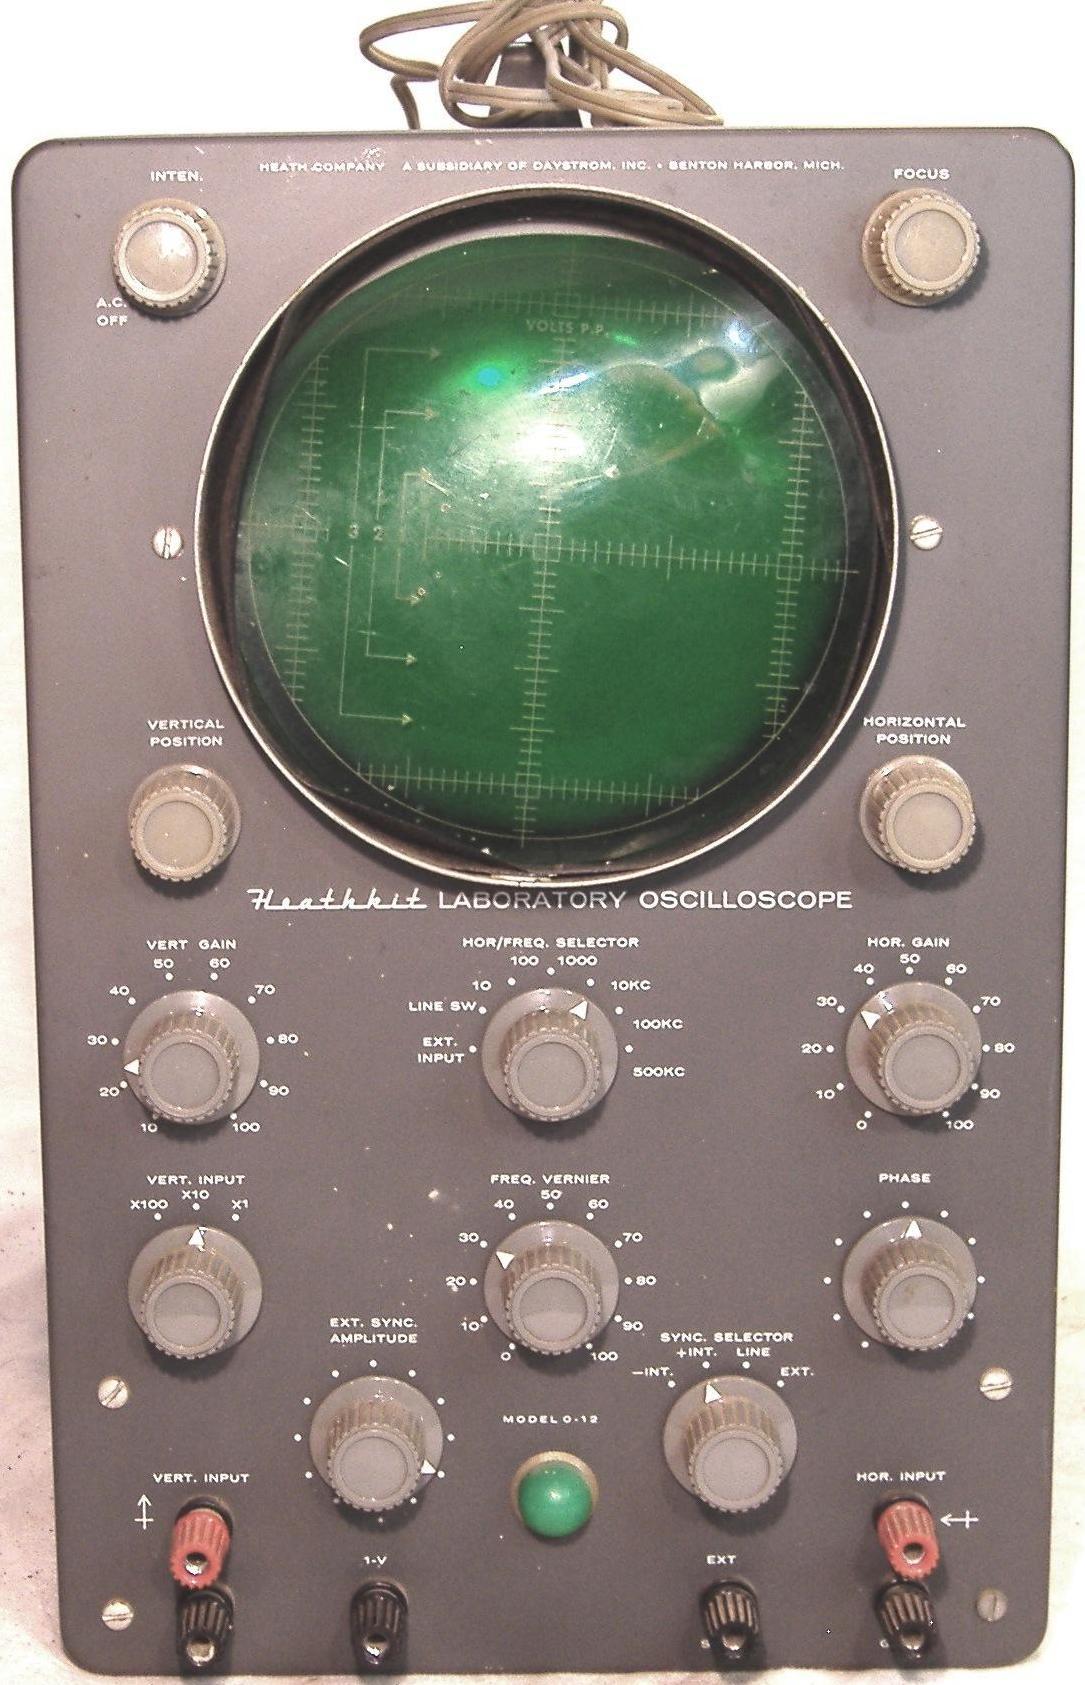 Building A Oscilloscope : Building a hobbyist oscilloscope electrical engineering